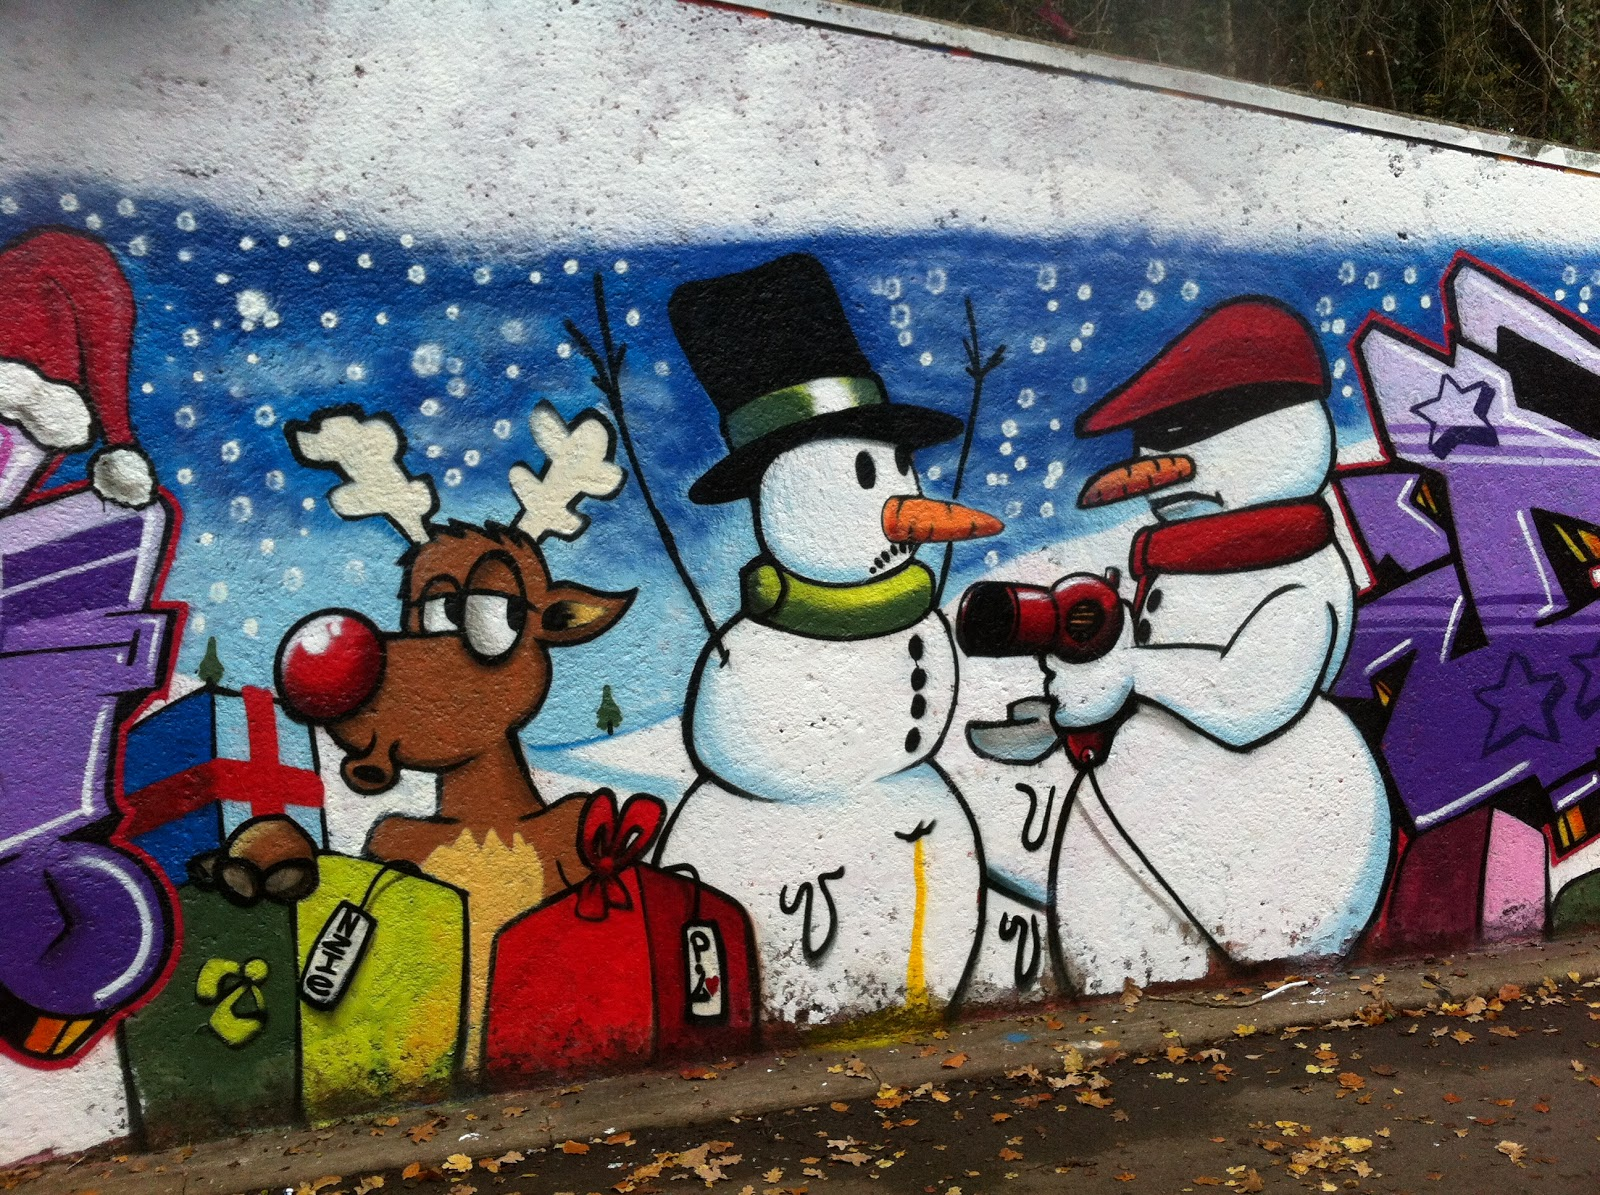 Natal Wallpaper 3d The Cabbages Of Doom When Snowmen Go Bad Christmas Graffiti